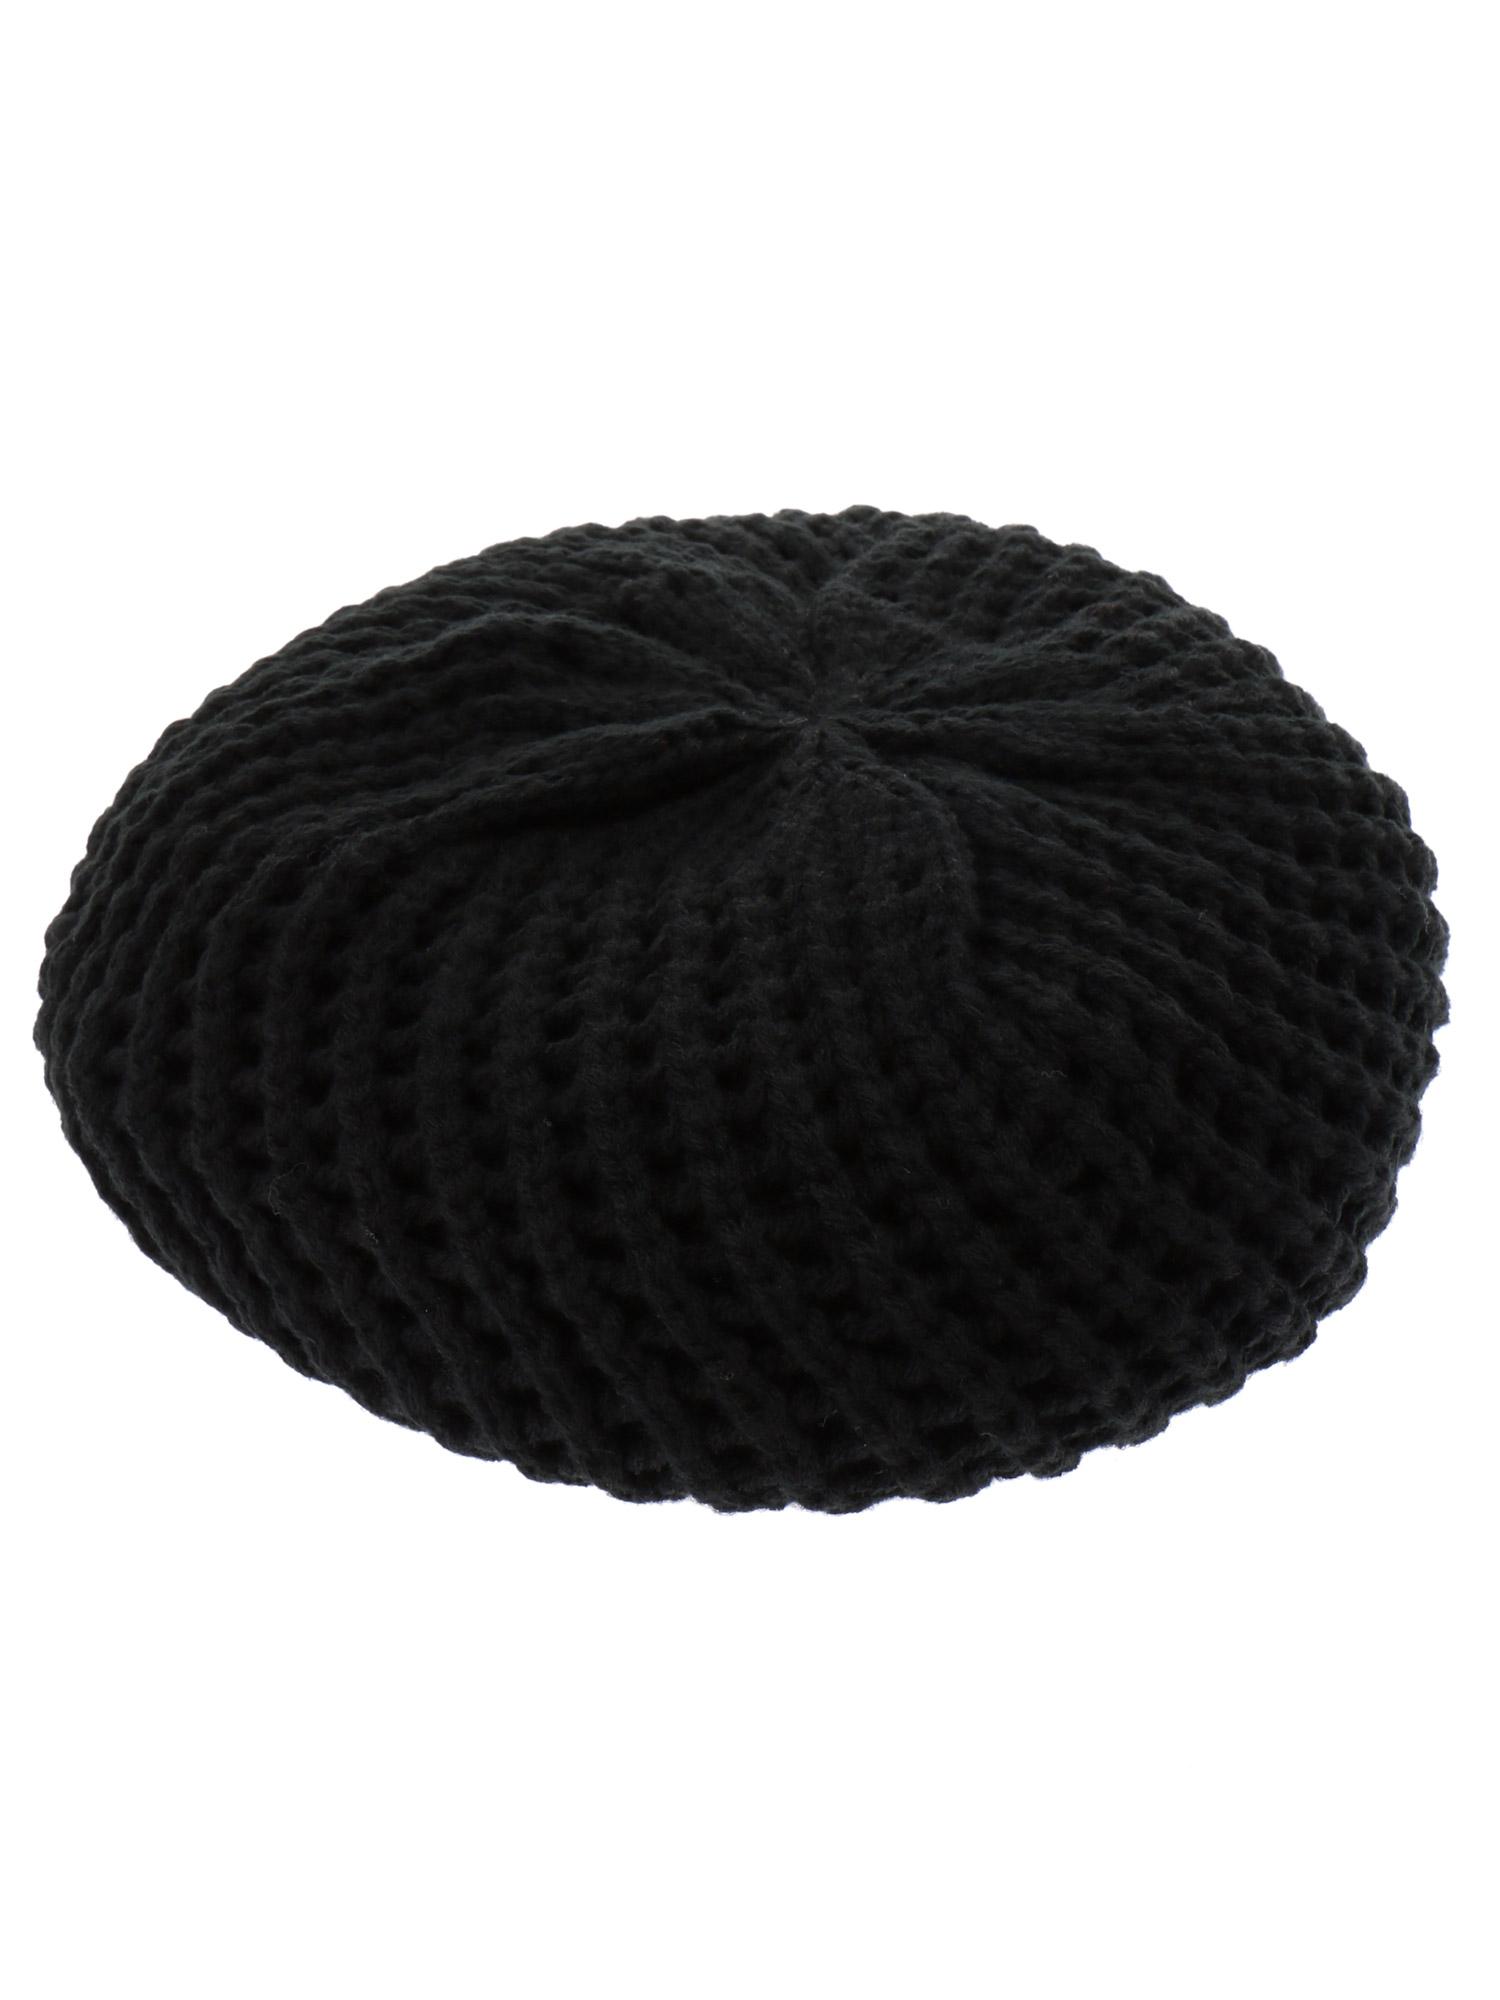 WEGO/NEWHATTANニットベレー帽